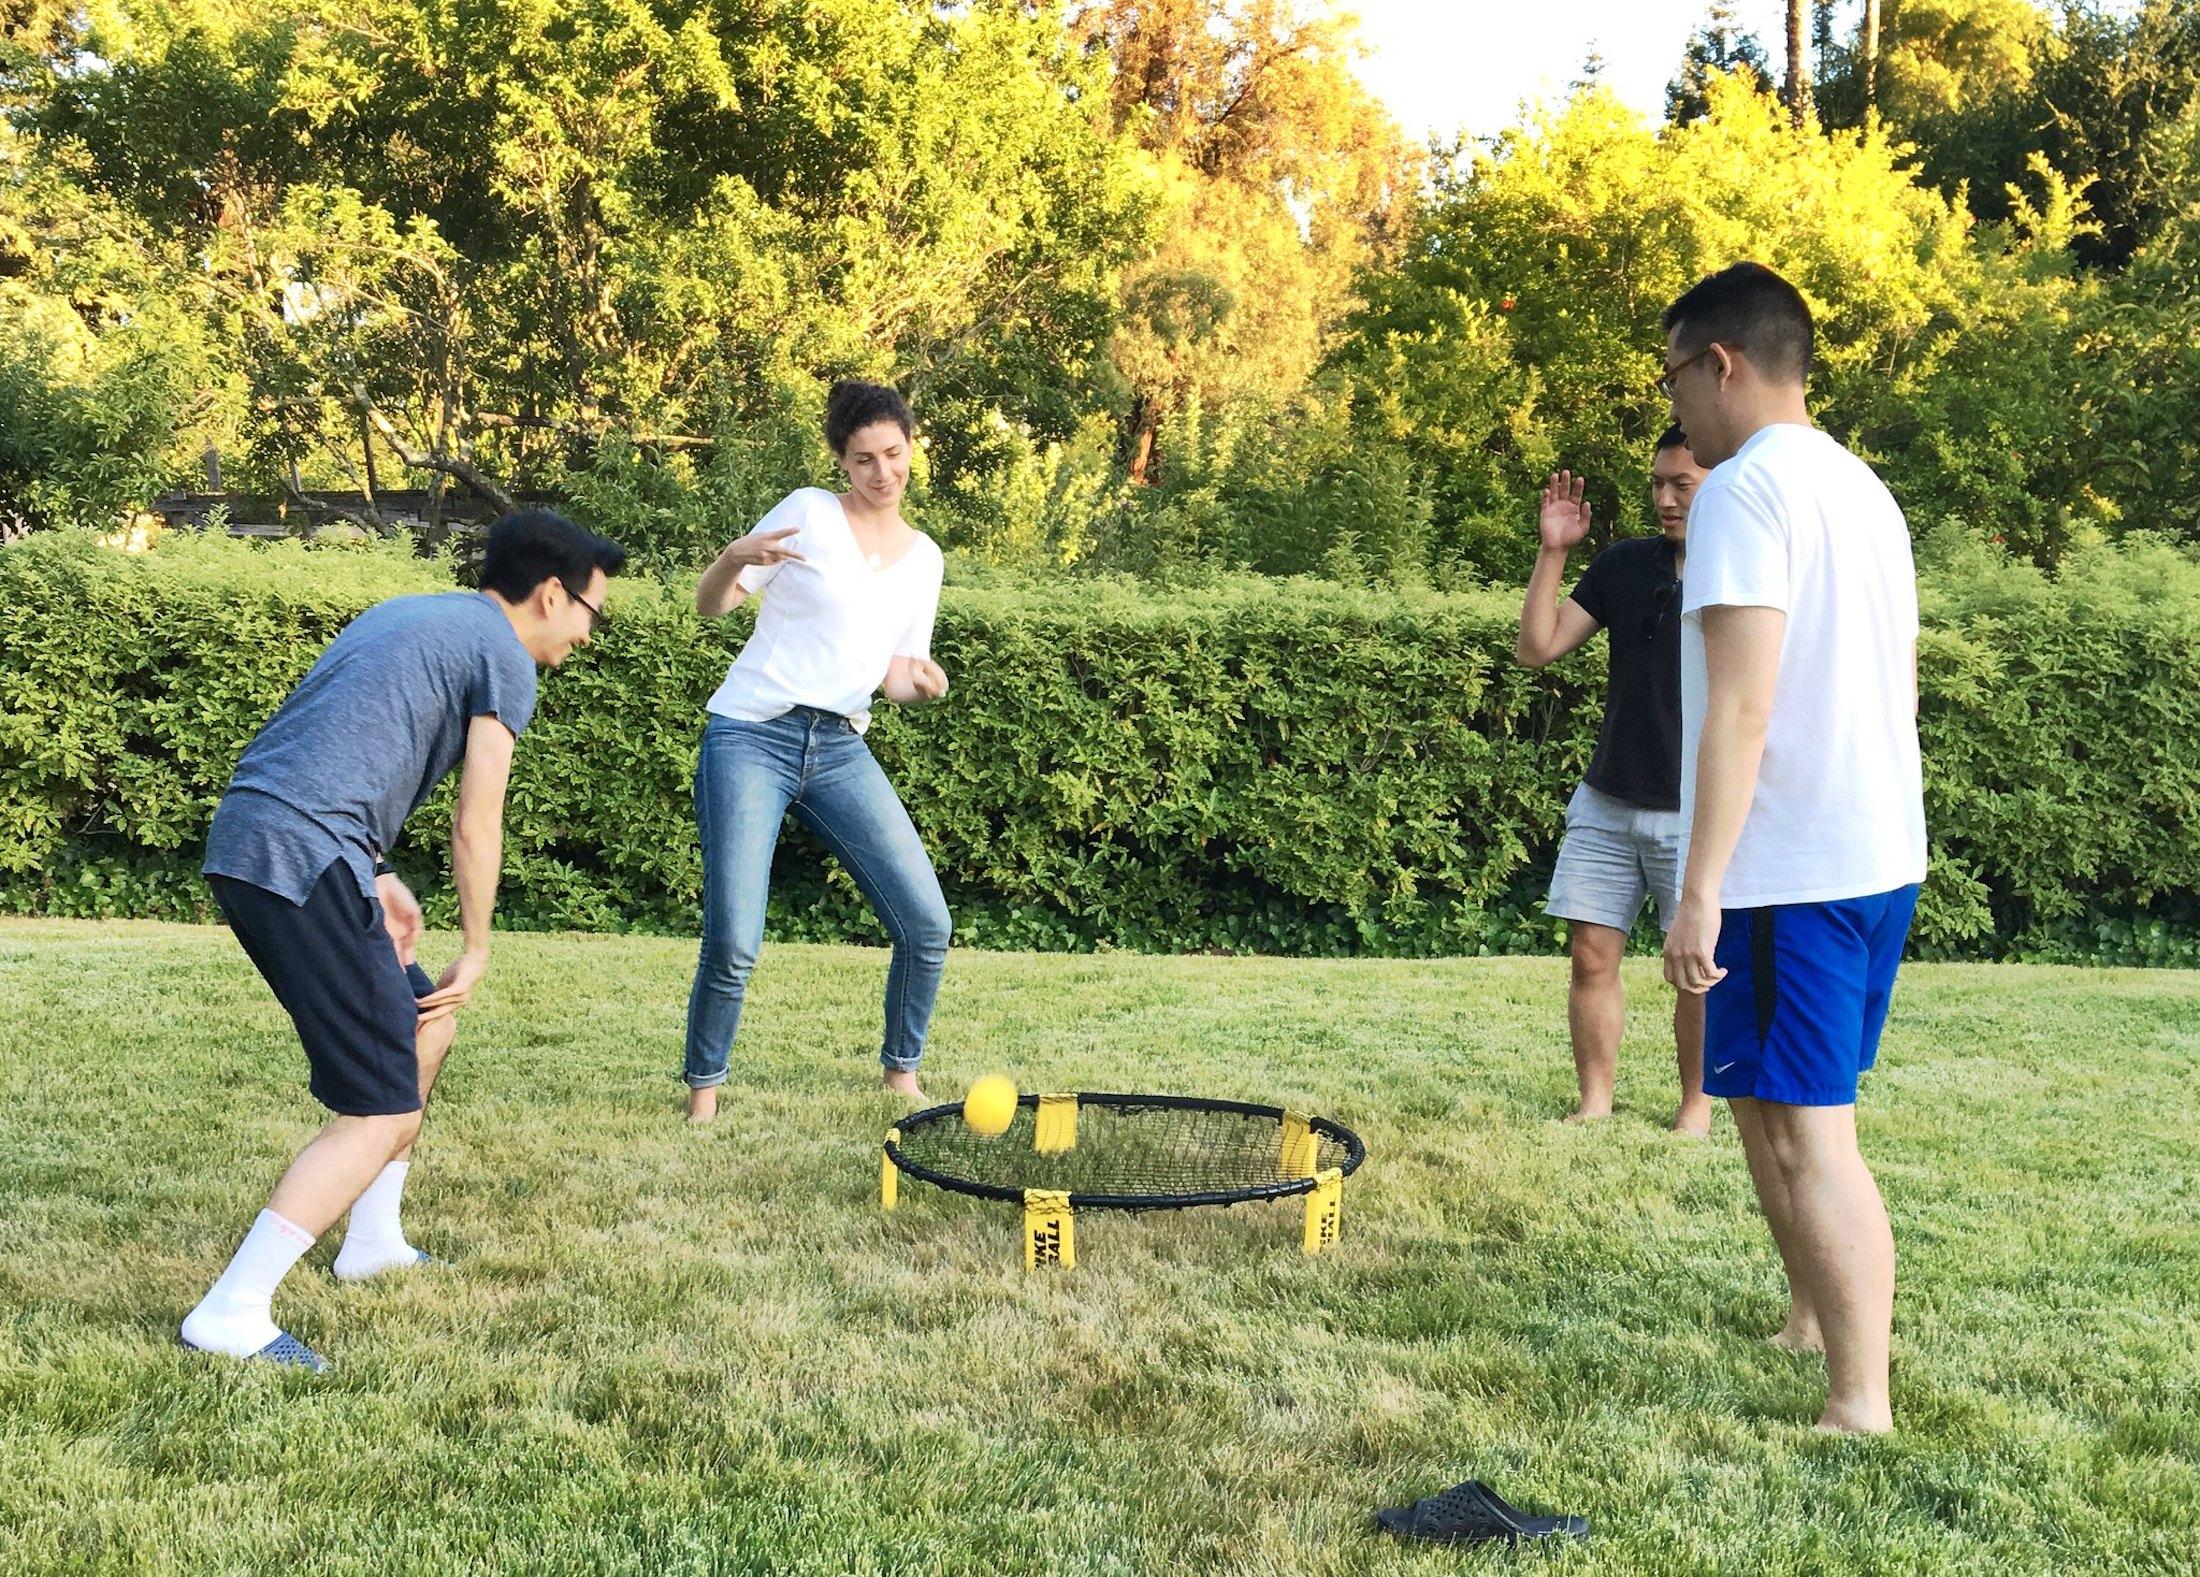 4 people playing spikeball